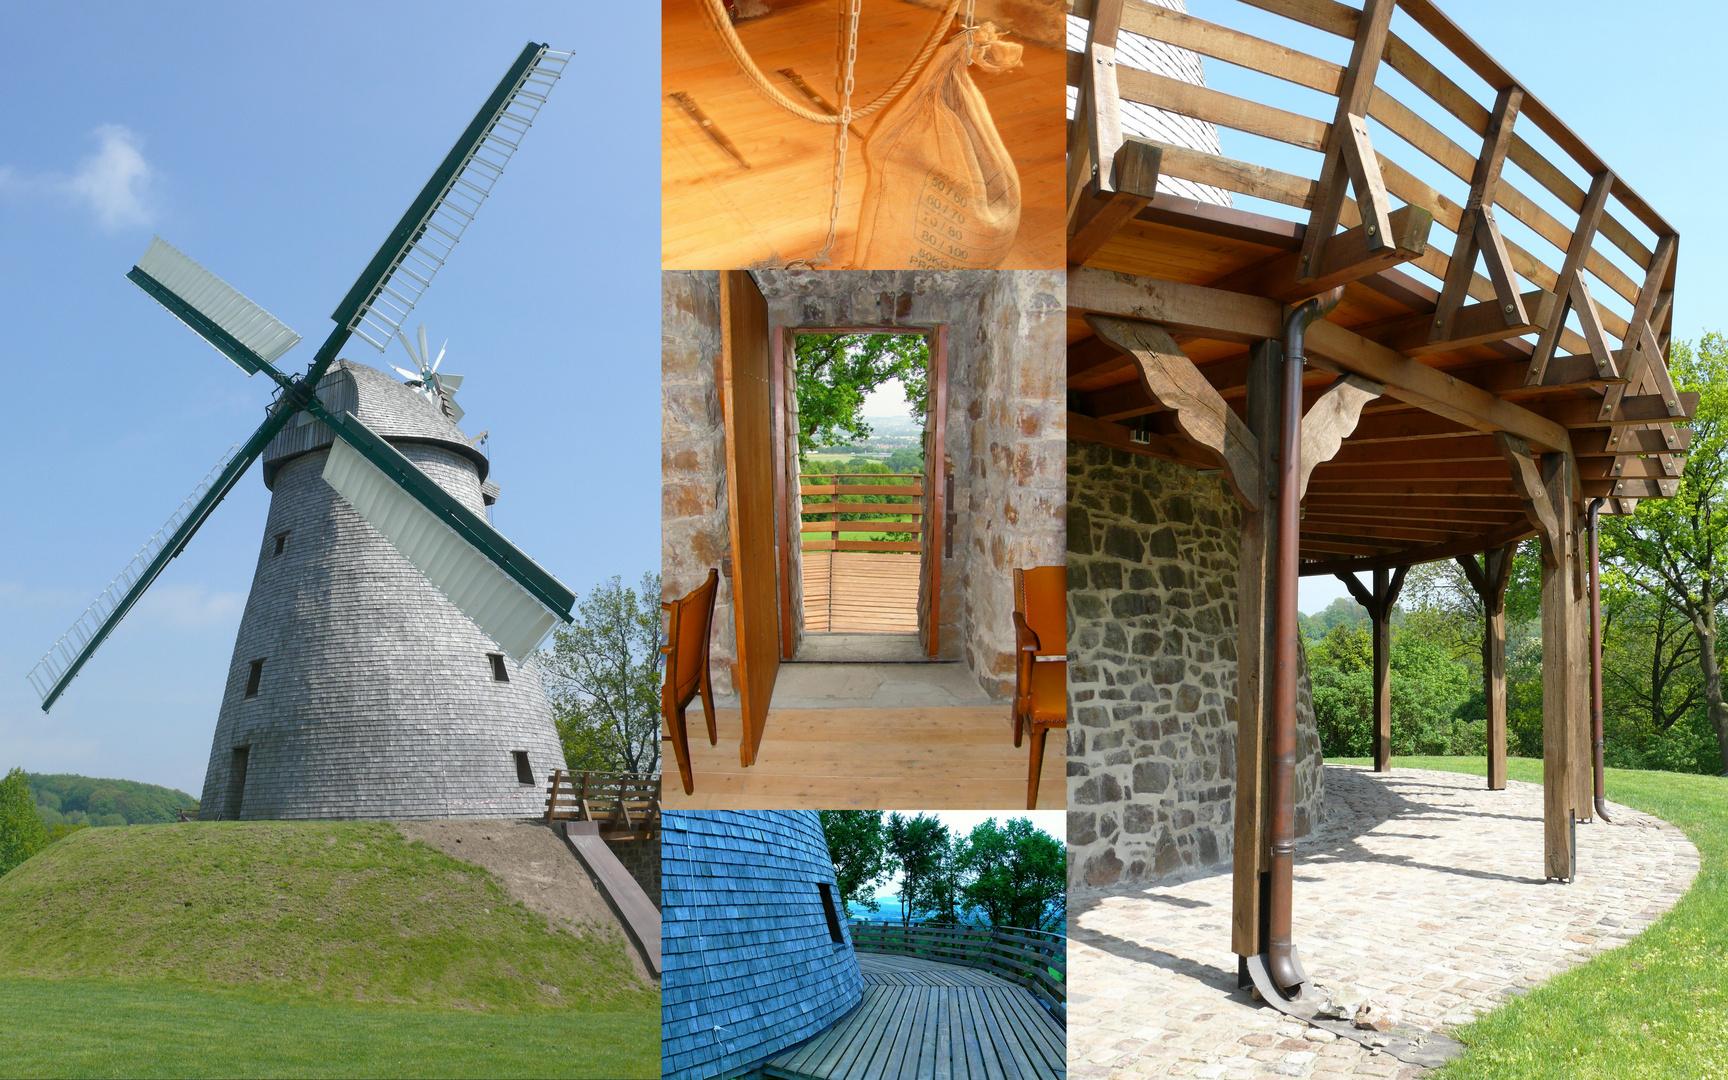 Collage der Windmühle in Exter (OWL)